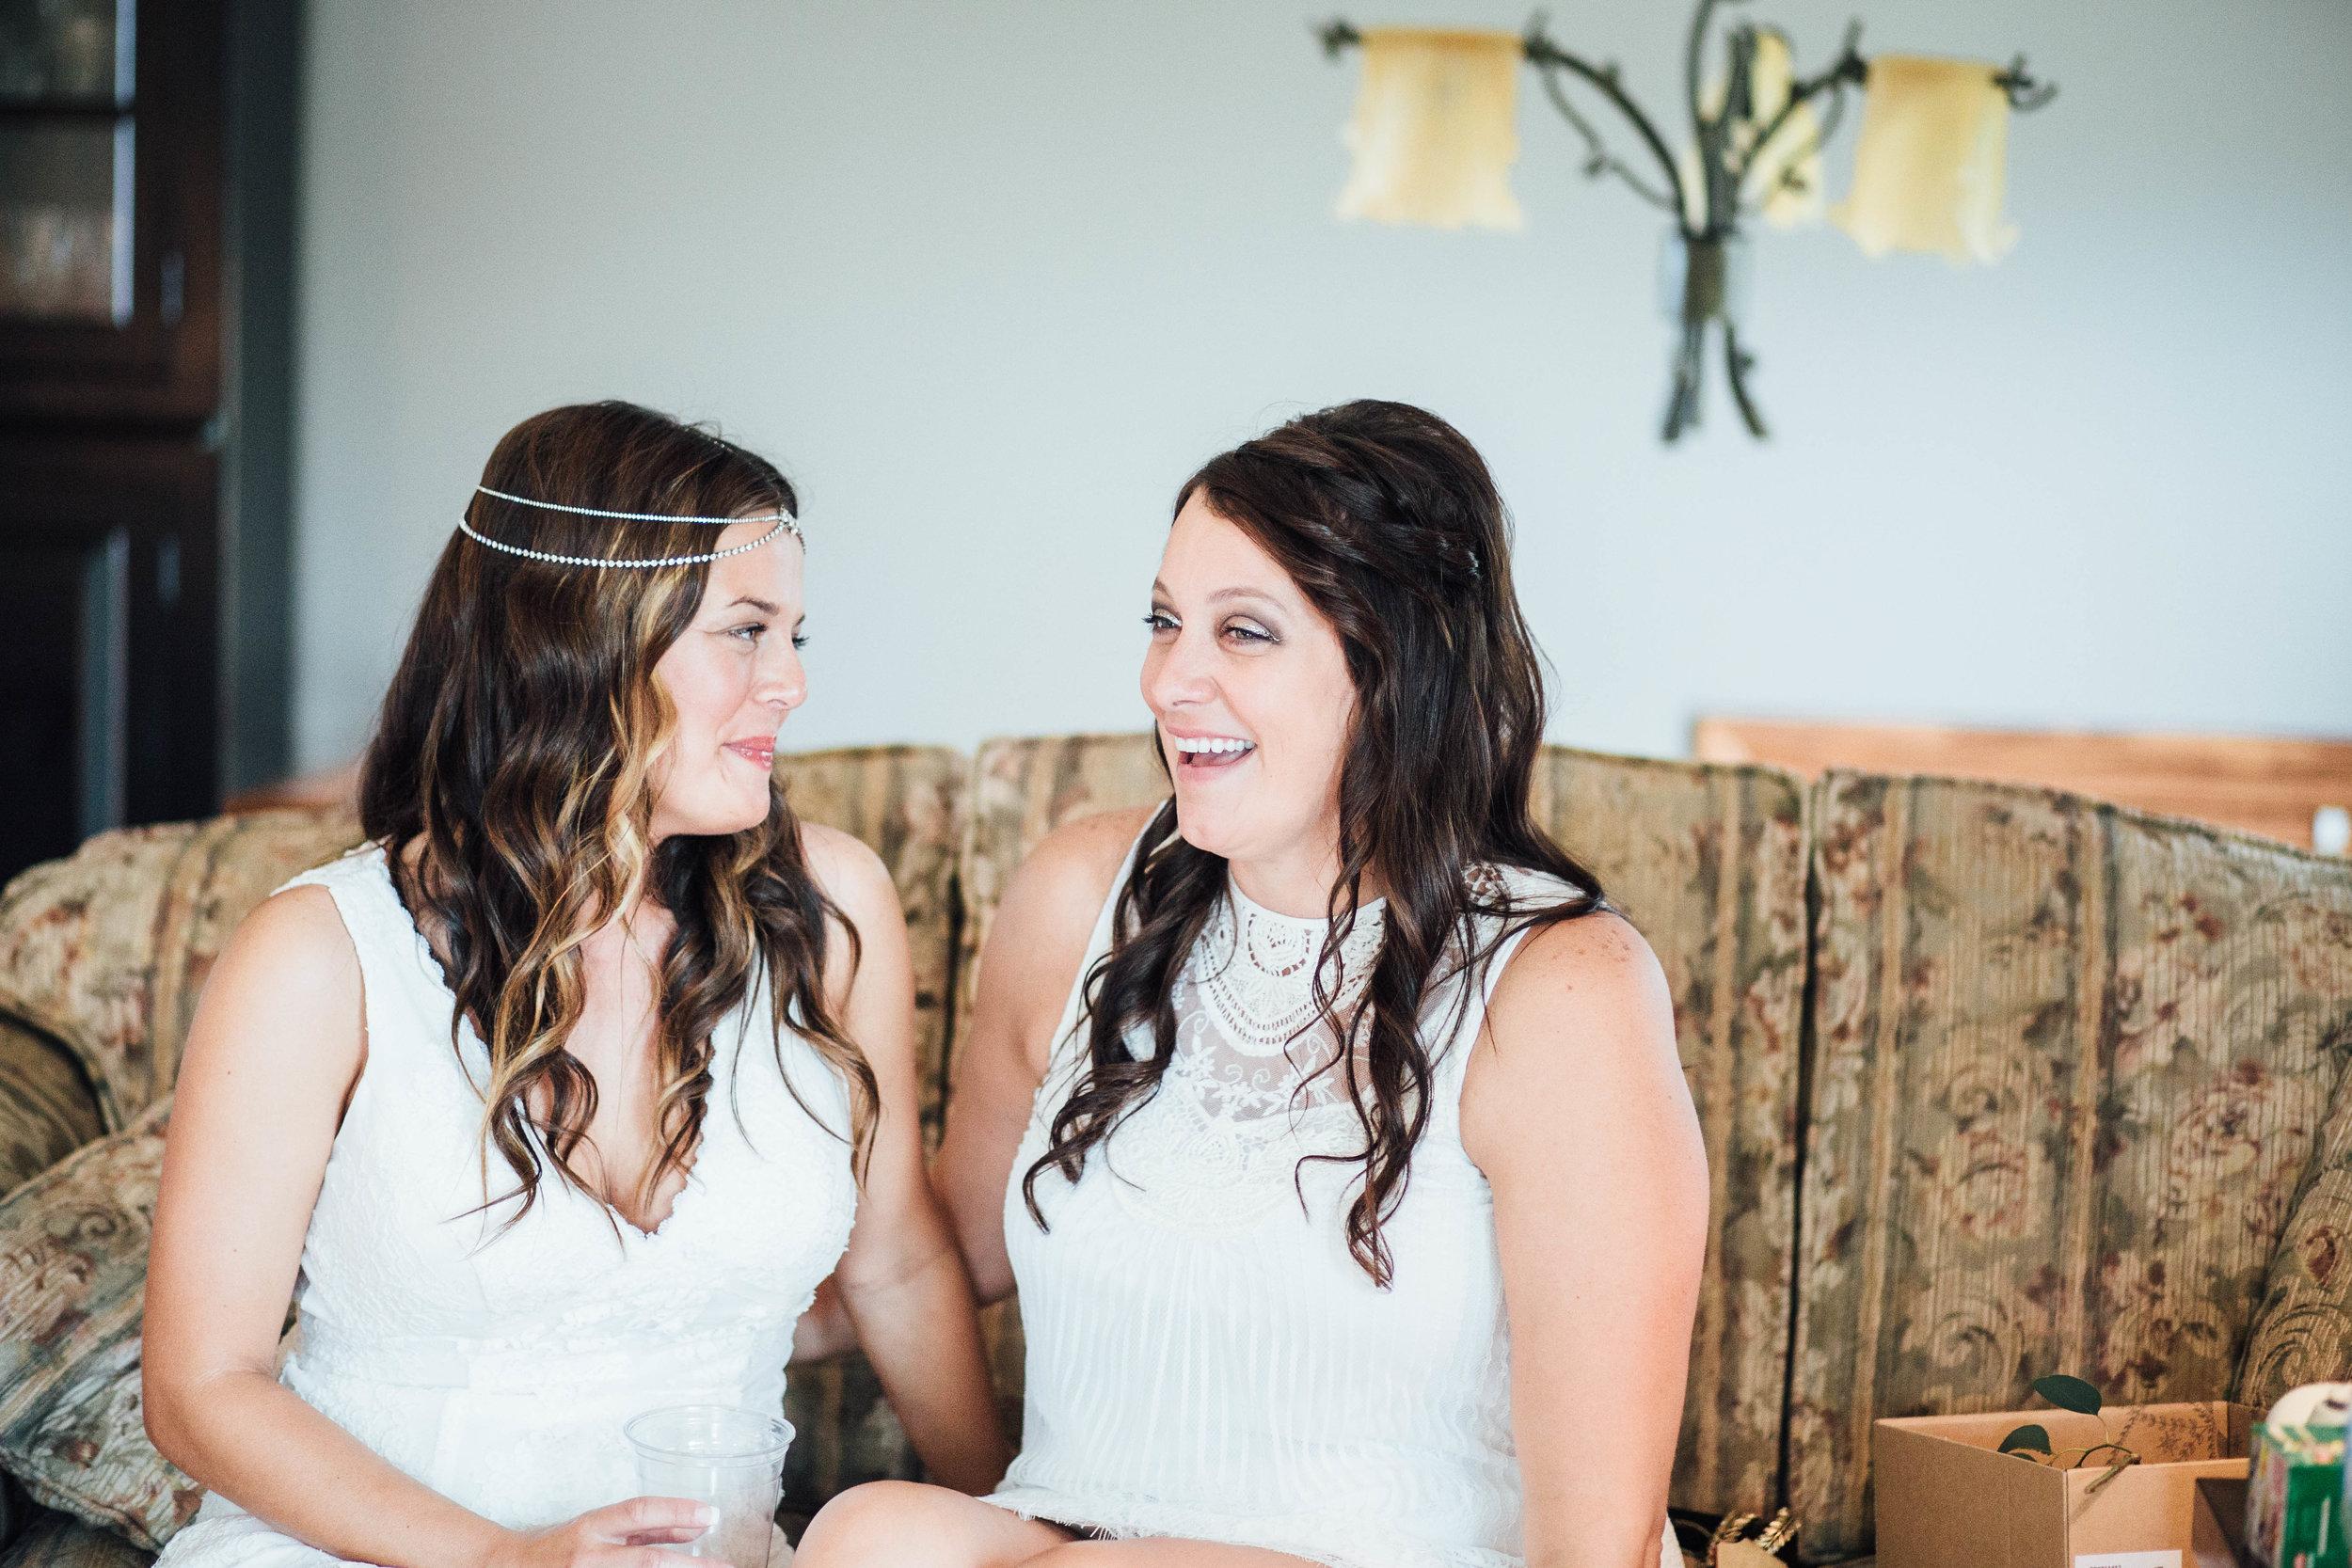 Bohemian Wedding - Sabrina Leigh Studios - Northern Michigan Wedding Photographer034.jpg